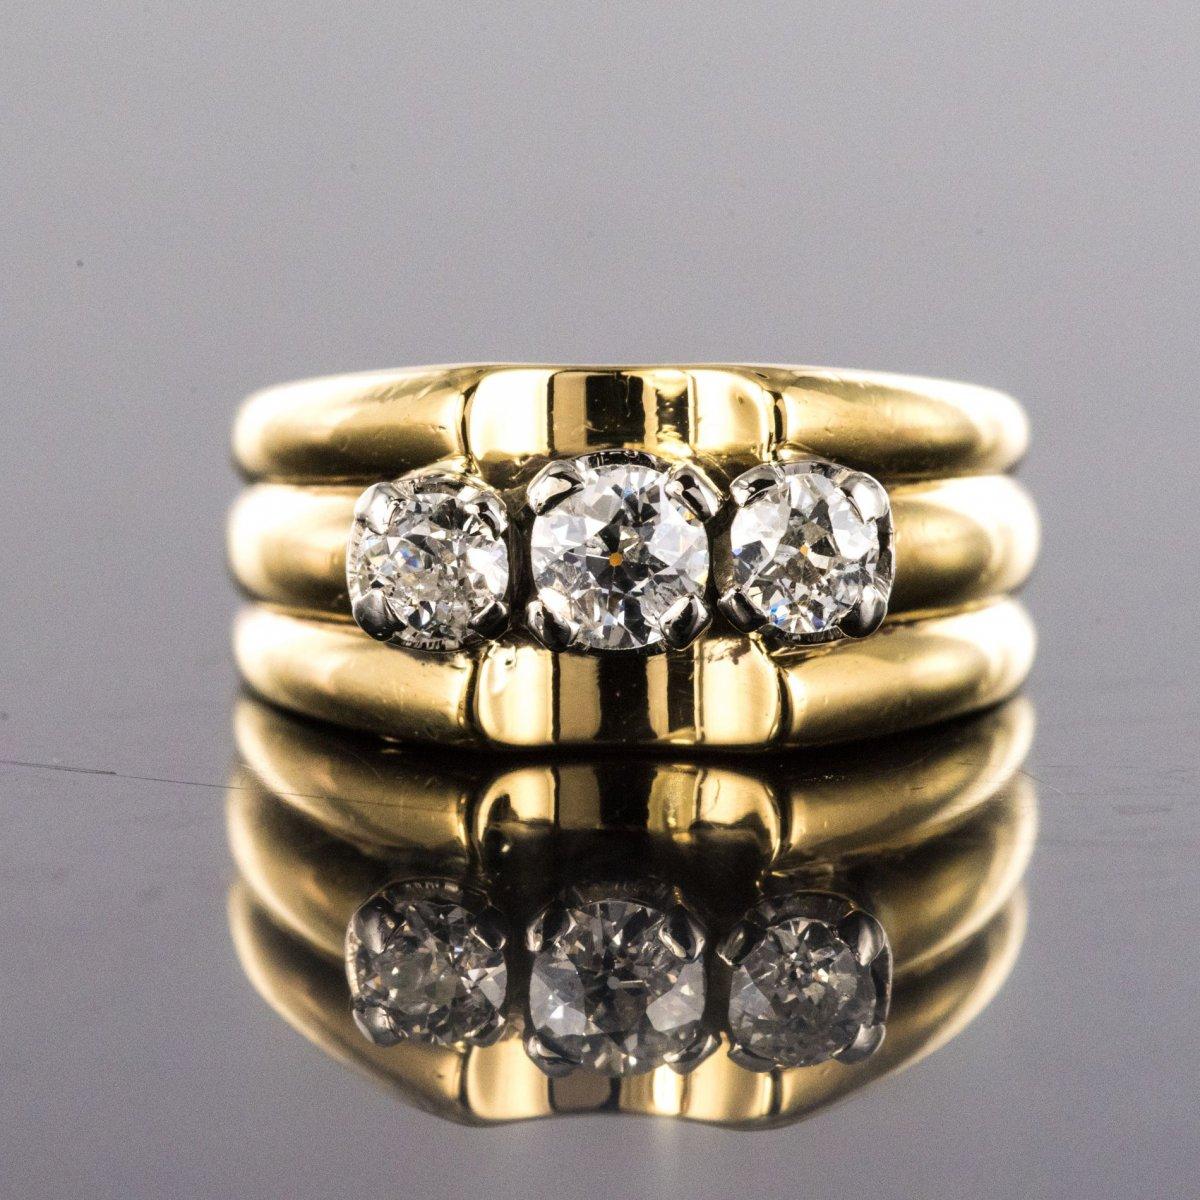 Bague Tank Or Jaune 3 Diamants-photo-4